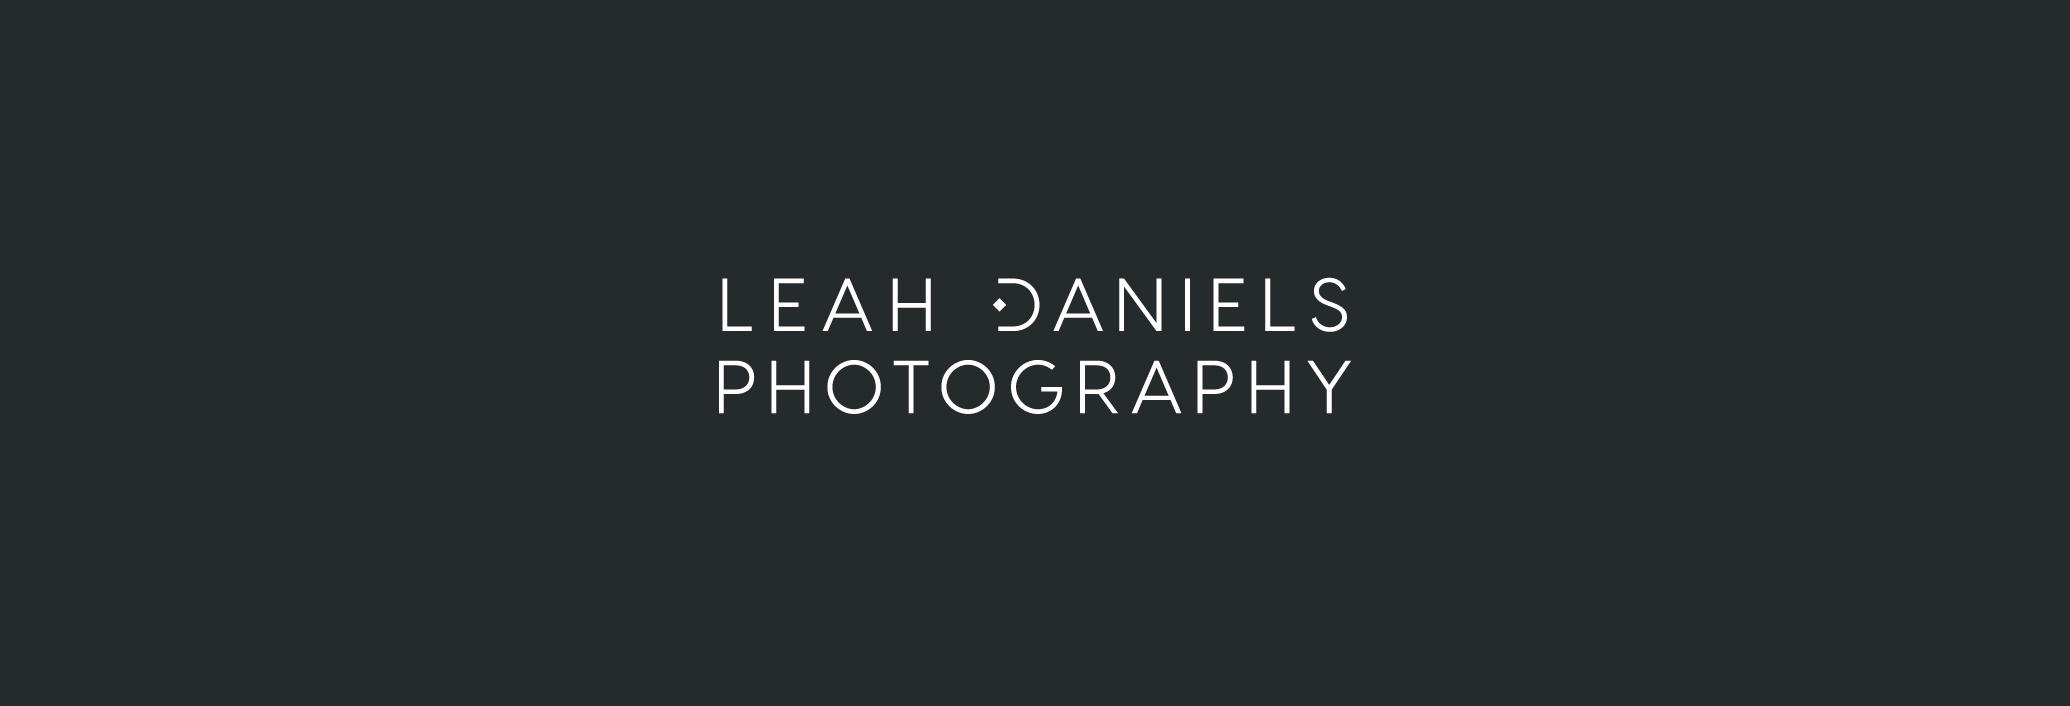 leah-daniels-photography-header.jpg